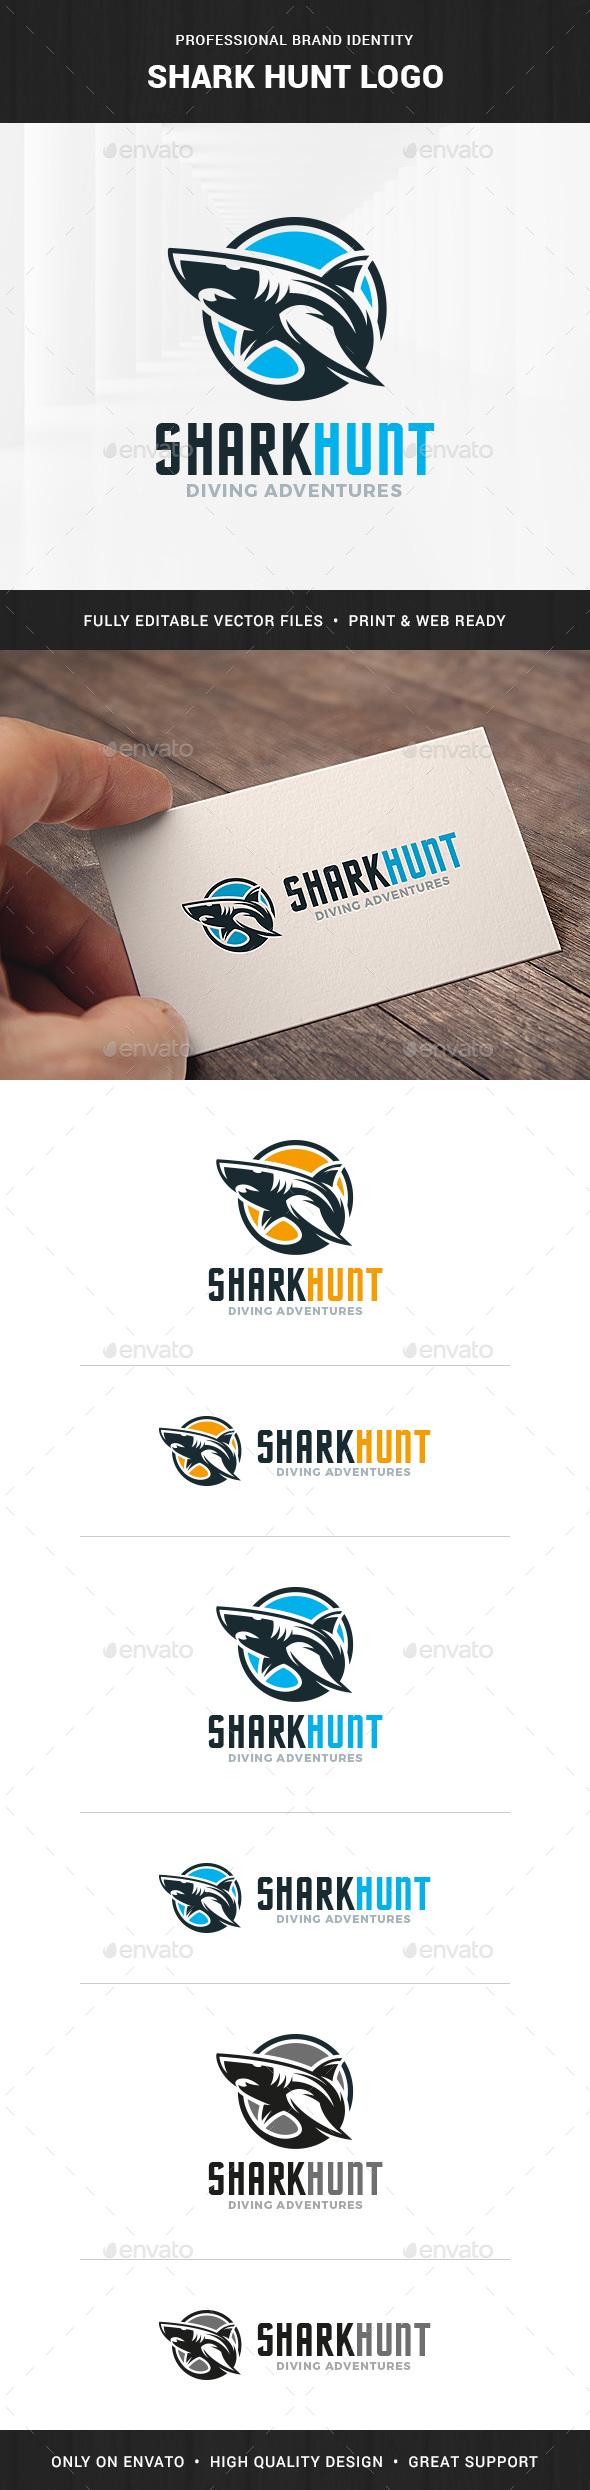 Shark Hunt Logo Template